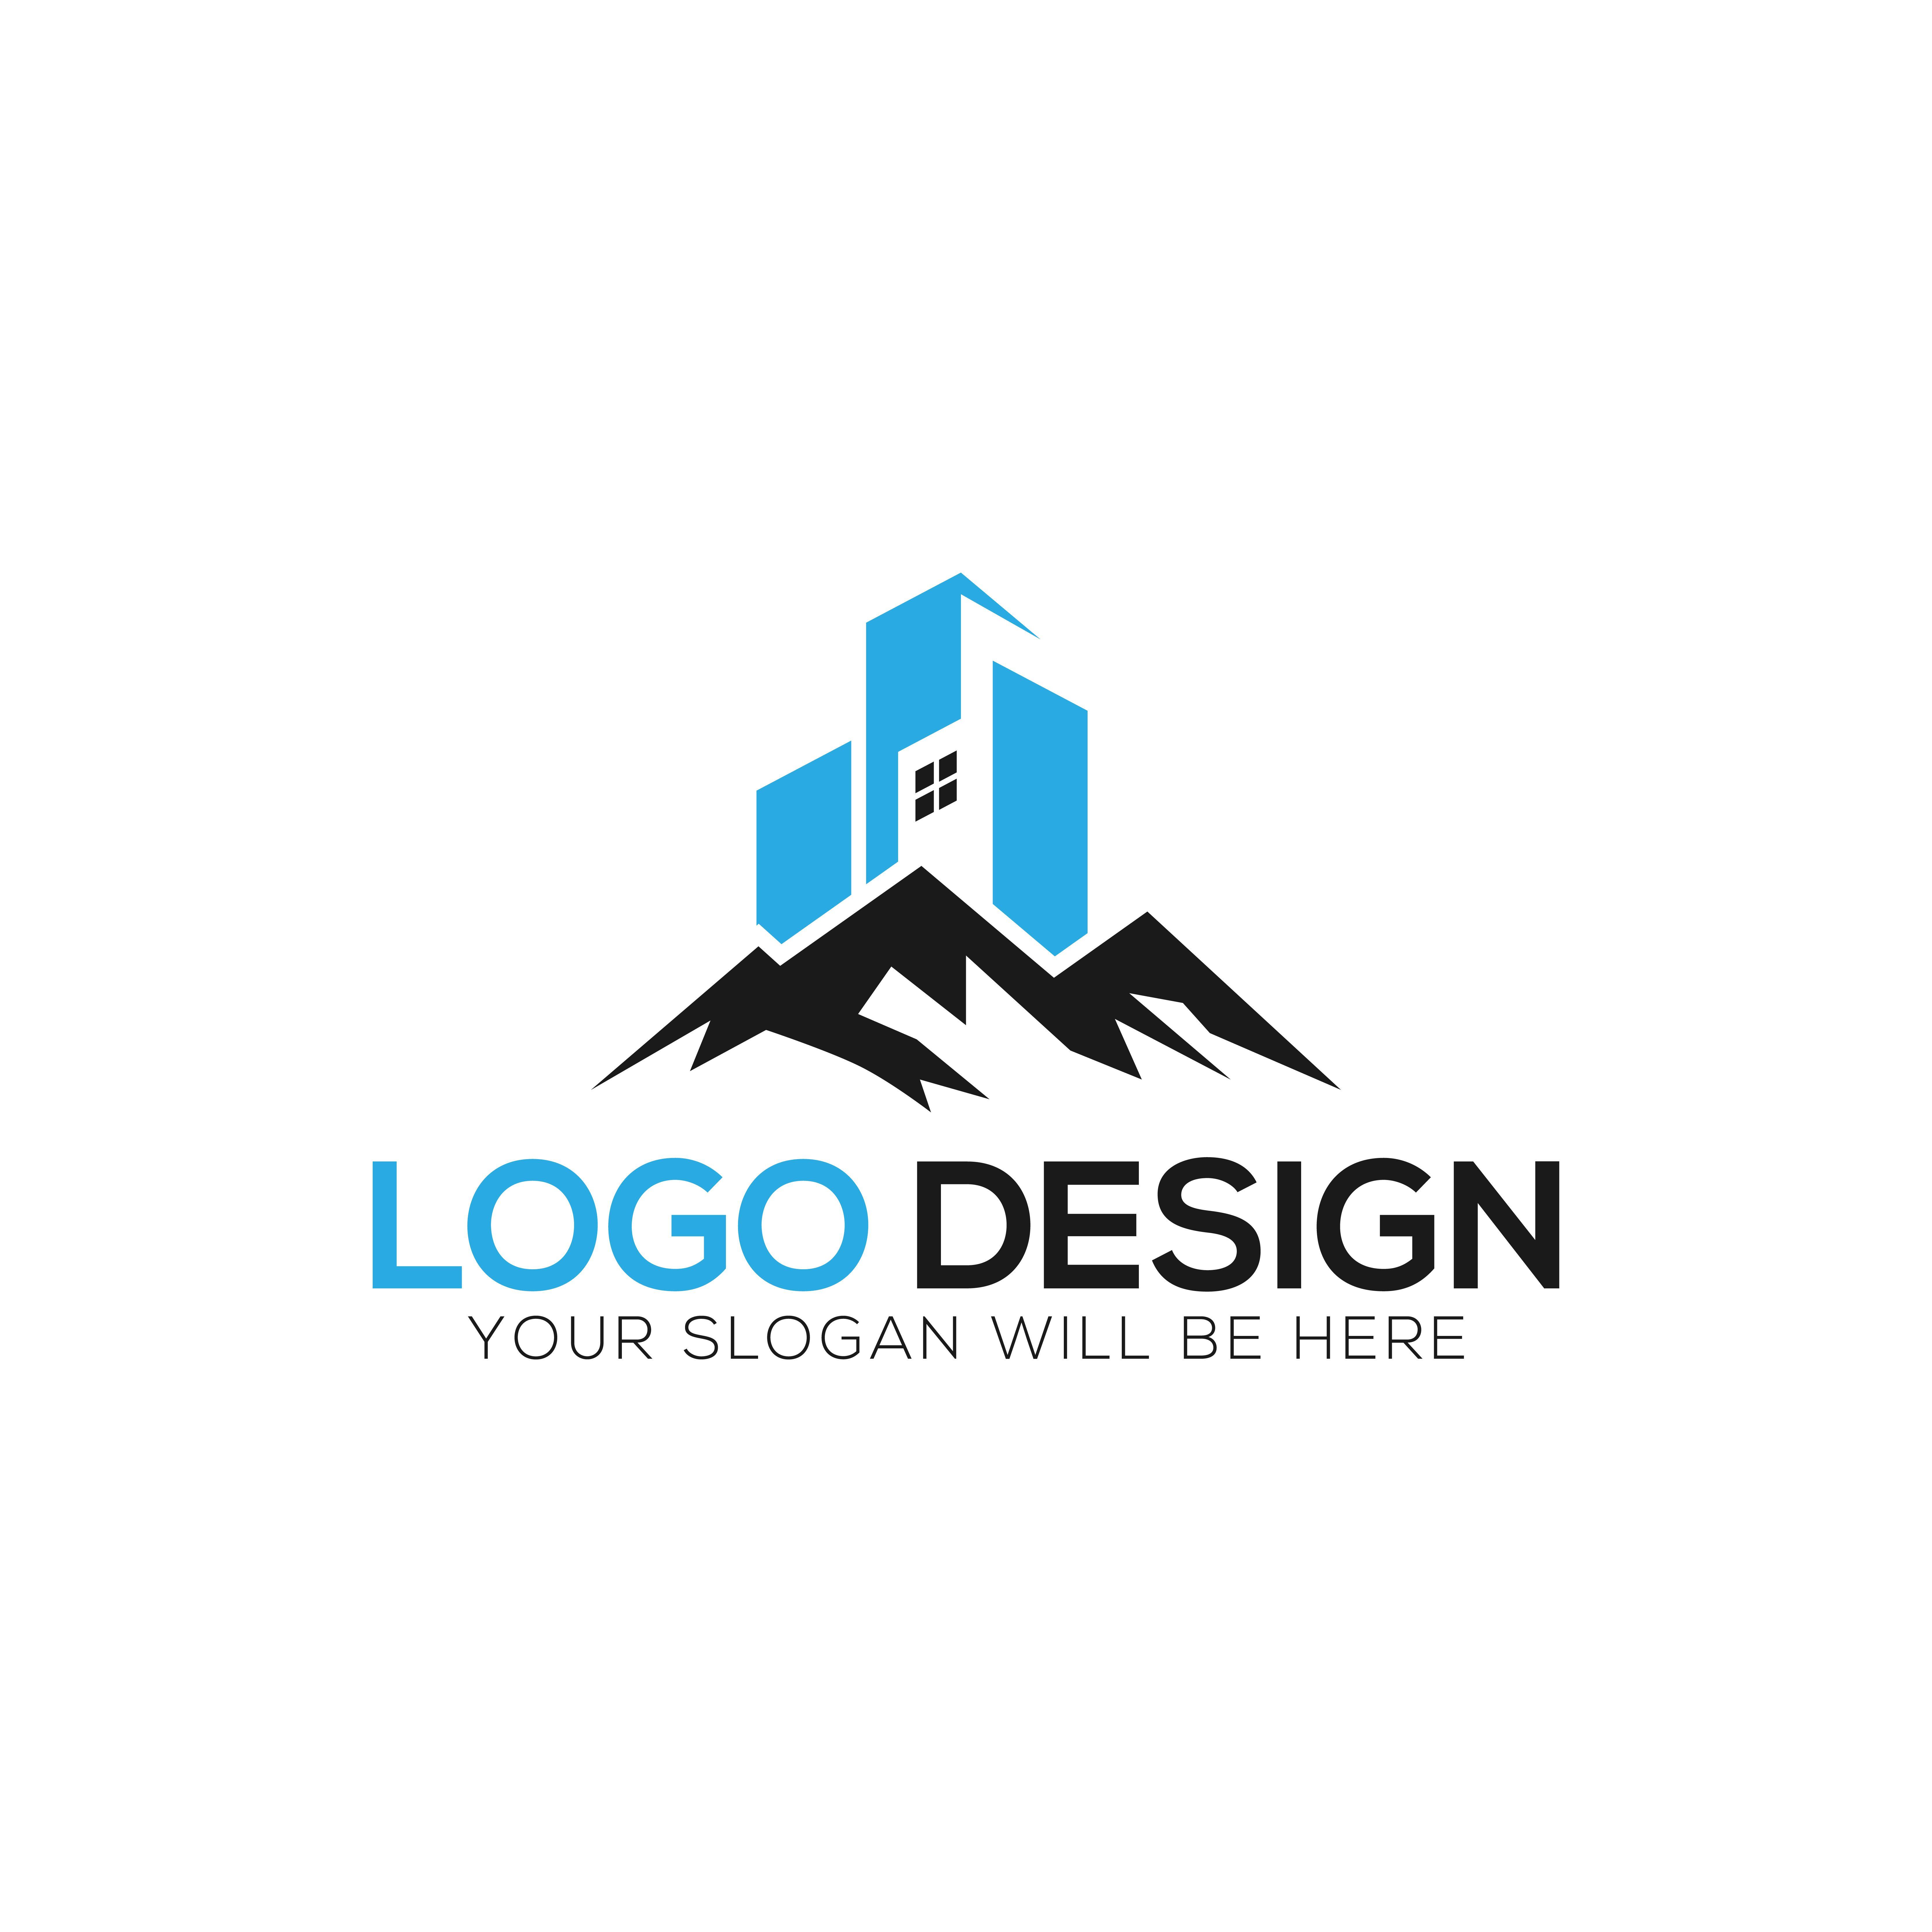 Building and Mountain Logo Design Vector Illustration